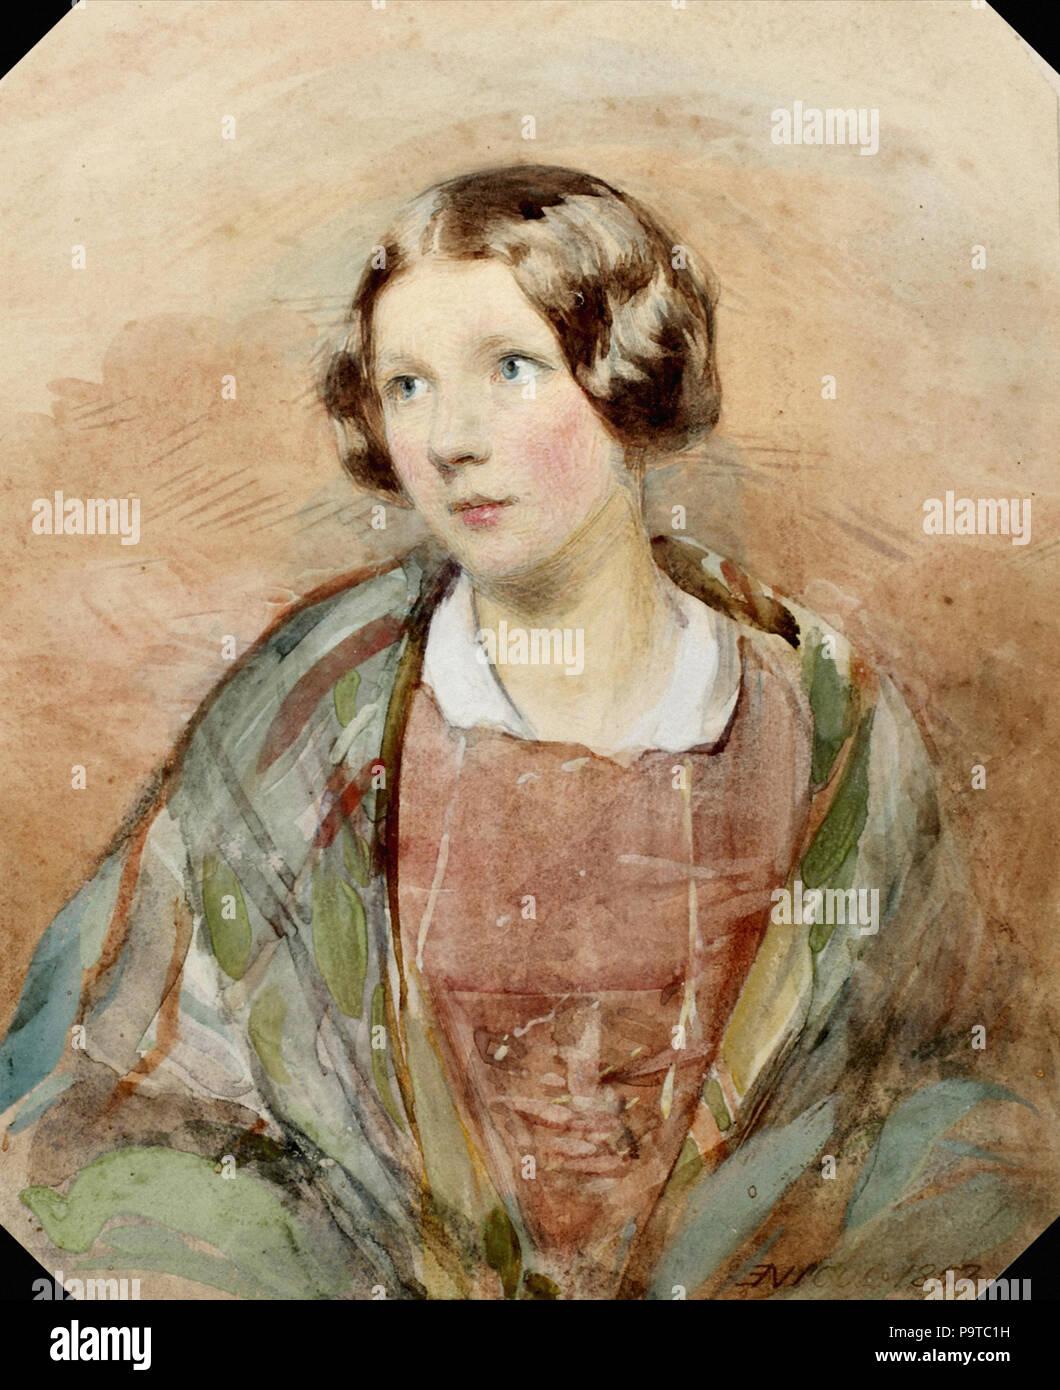 Nicol  Erskine - a Scottish Lady - Stock Image